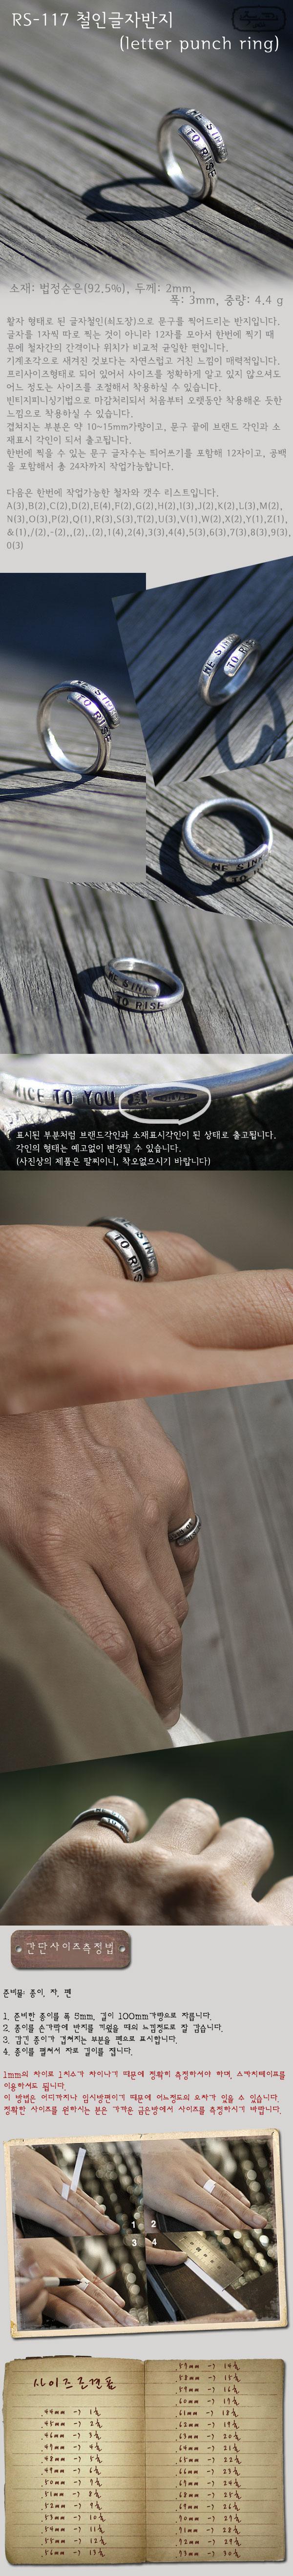 RS-117 철인글자반지(letter punch ring) - 수크, 38,000원, 실버, 실반지